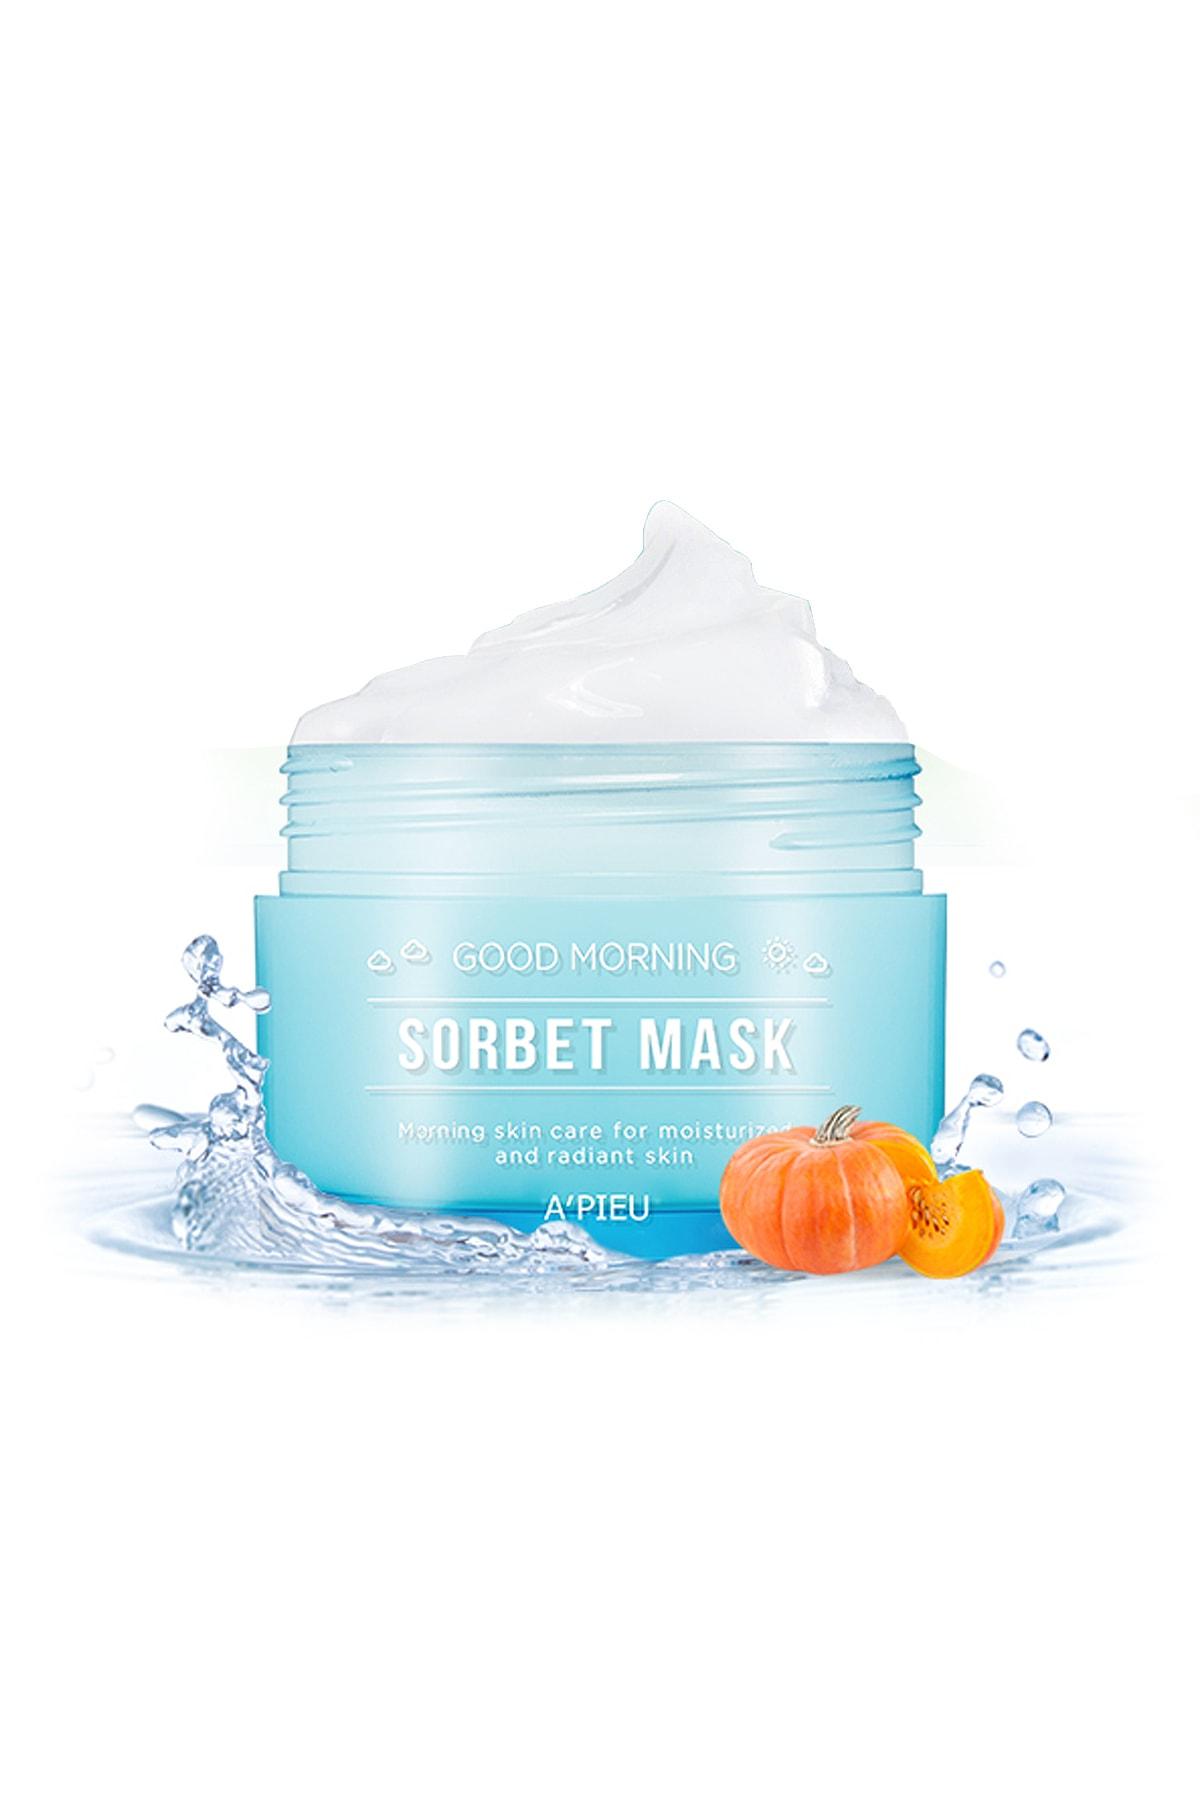 Missha Nemlendirici Sabah Bakım Maskesi 105ml APIEU Good Morning Sorbet Mask